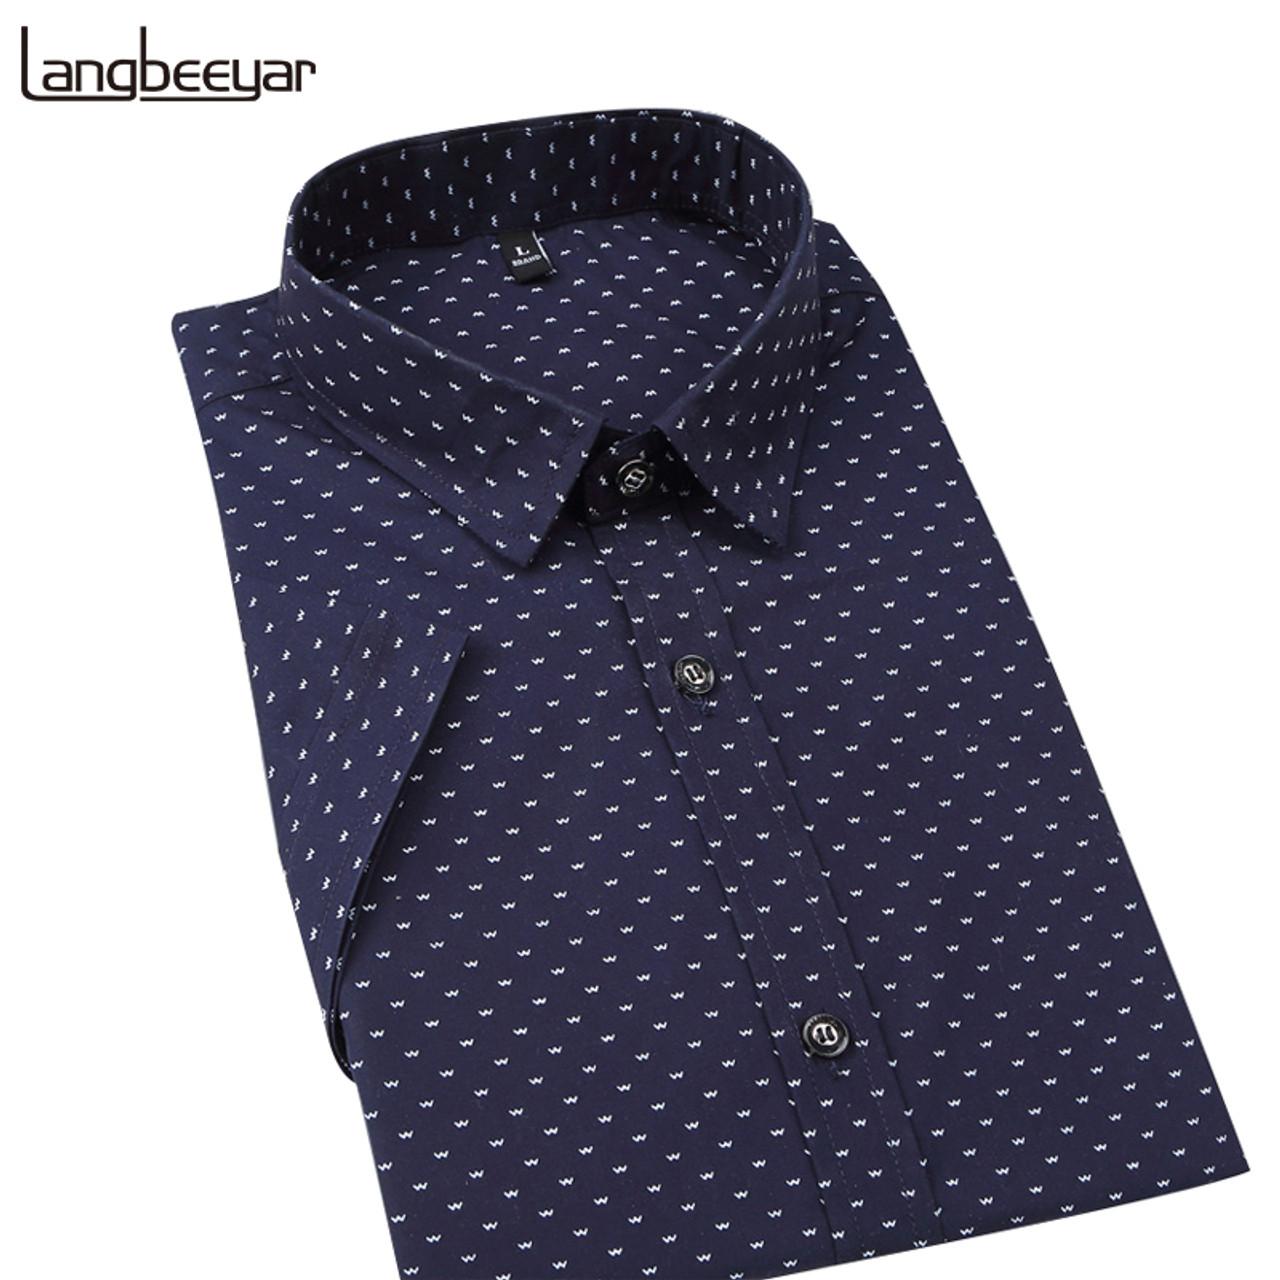 52d32721665 ... Hot 2018 Summer New Fashion Brand Clothing Men Short Sleeve Shirt Polka  Dot Slim Fit Shirt